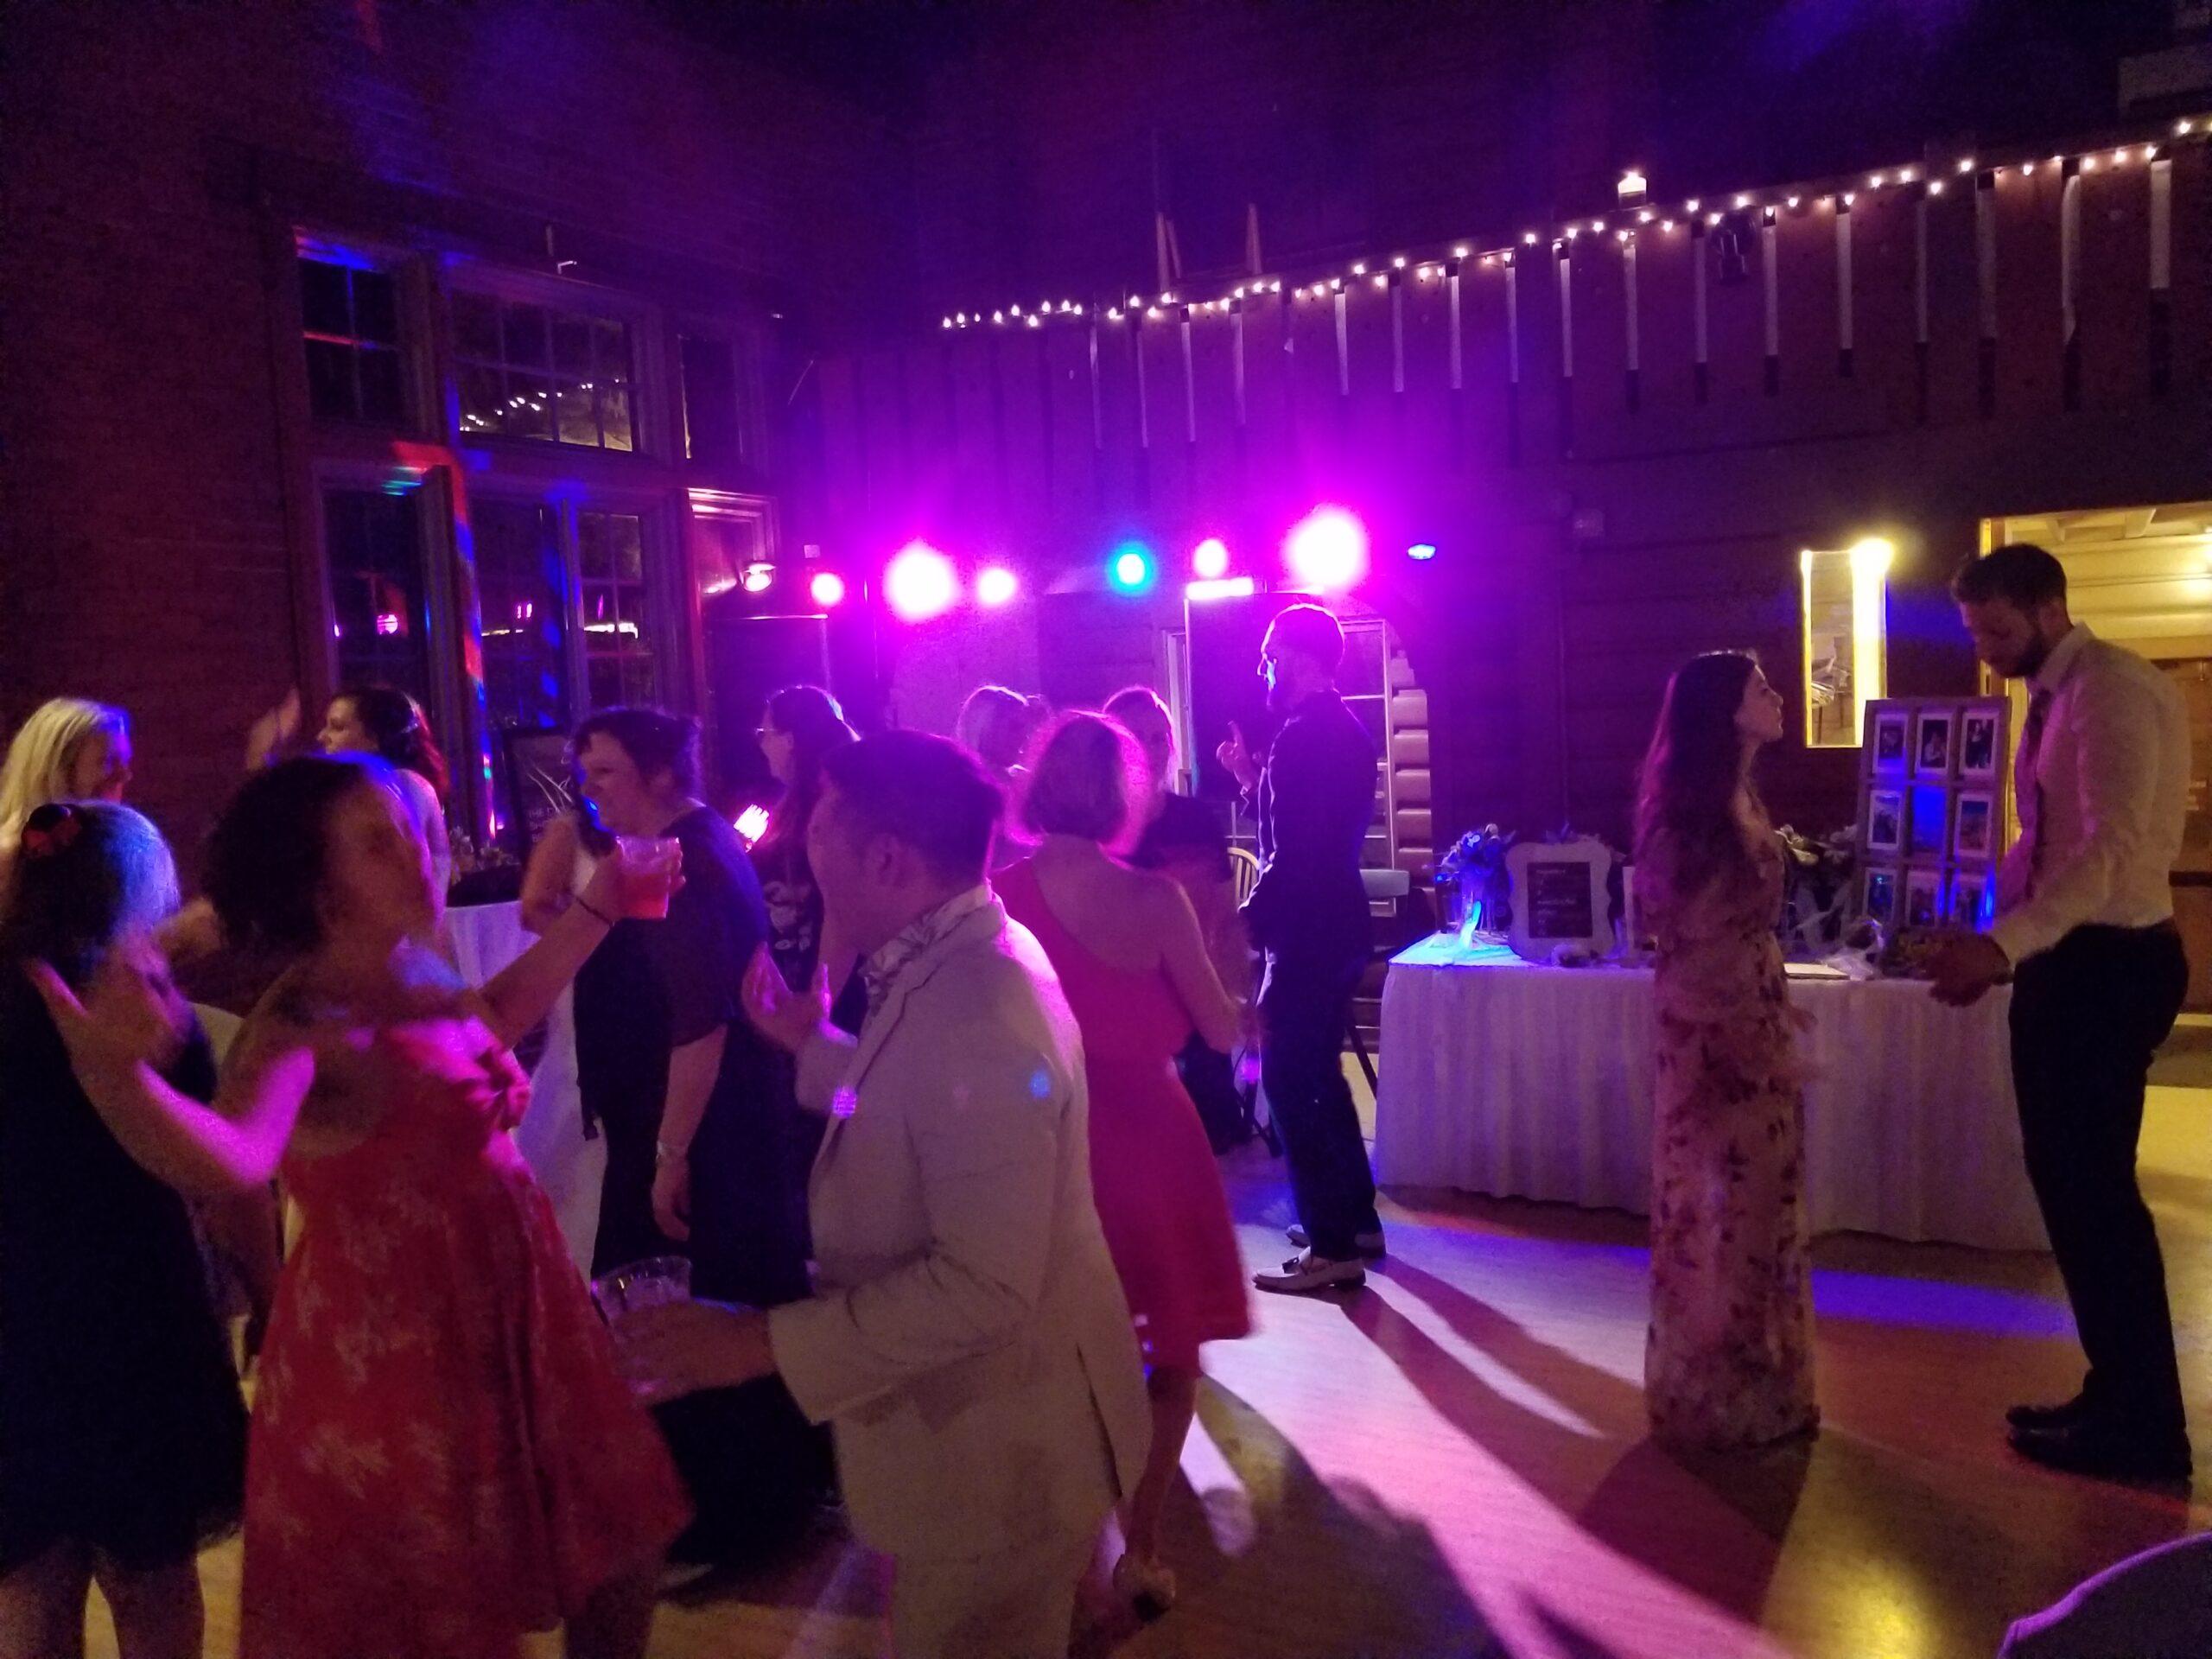 dj lighting at hubbard park lodge in milwaukee | MUP DJ services, an affordable wedding dj company